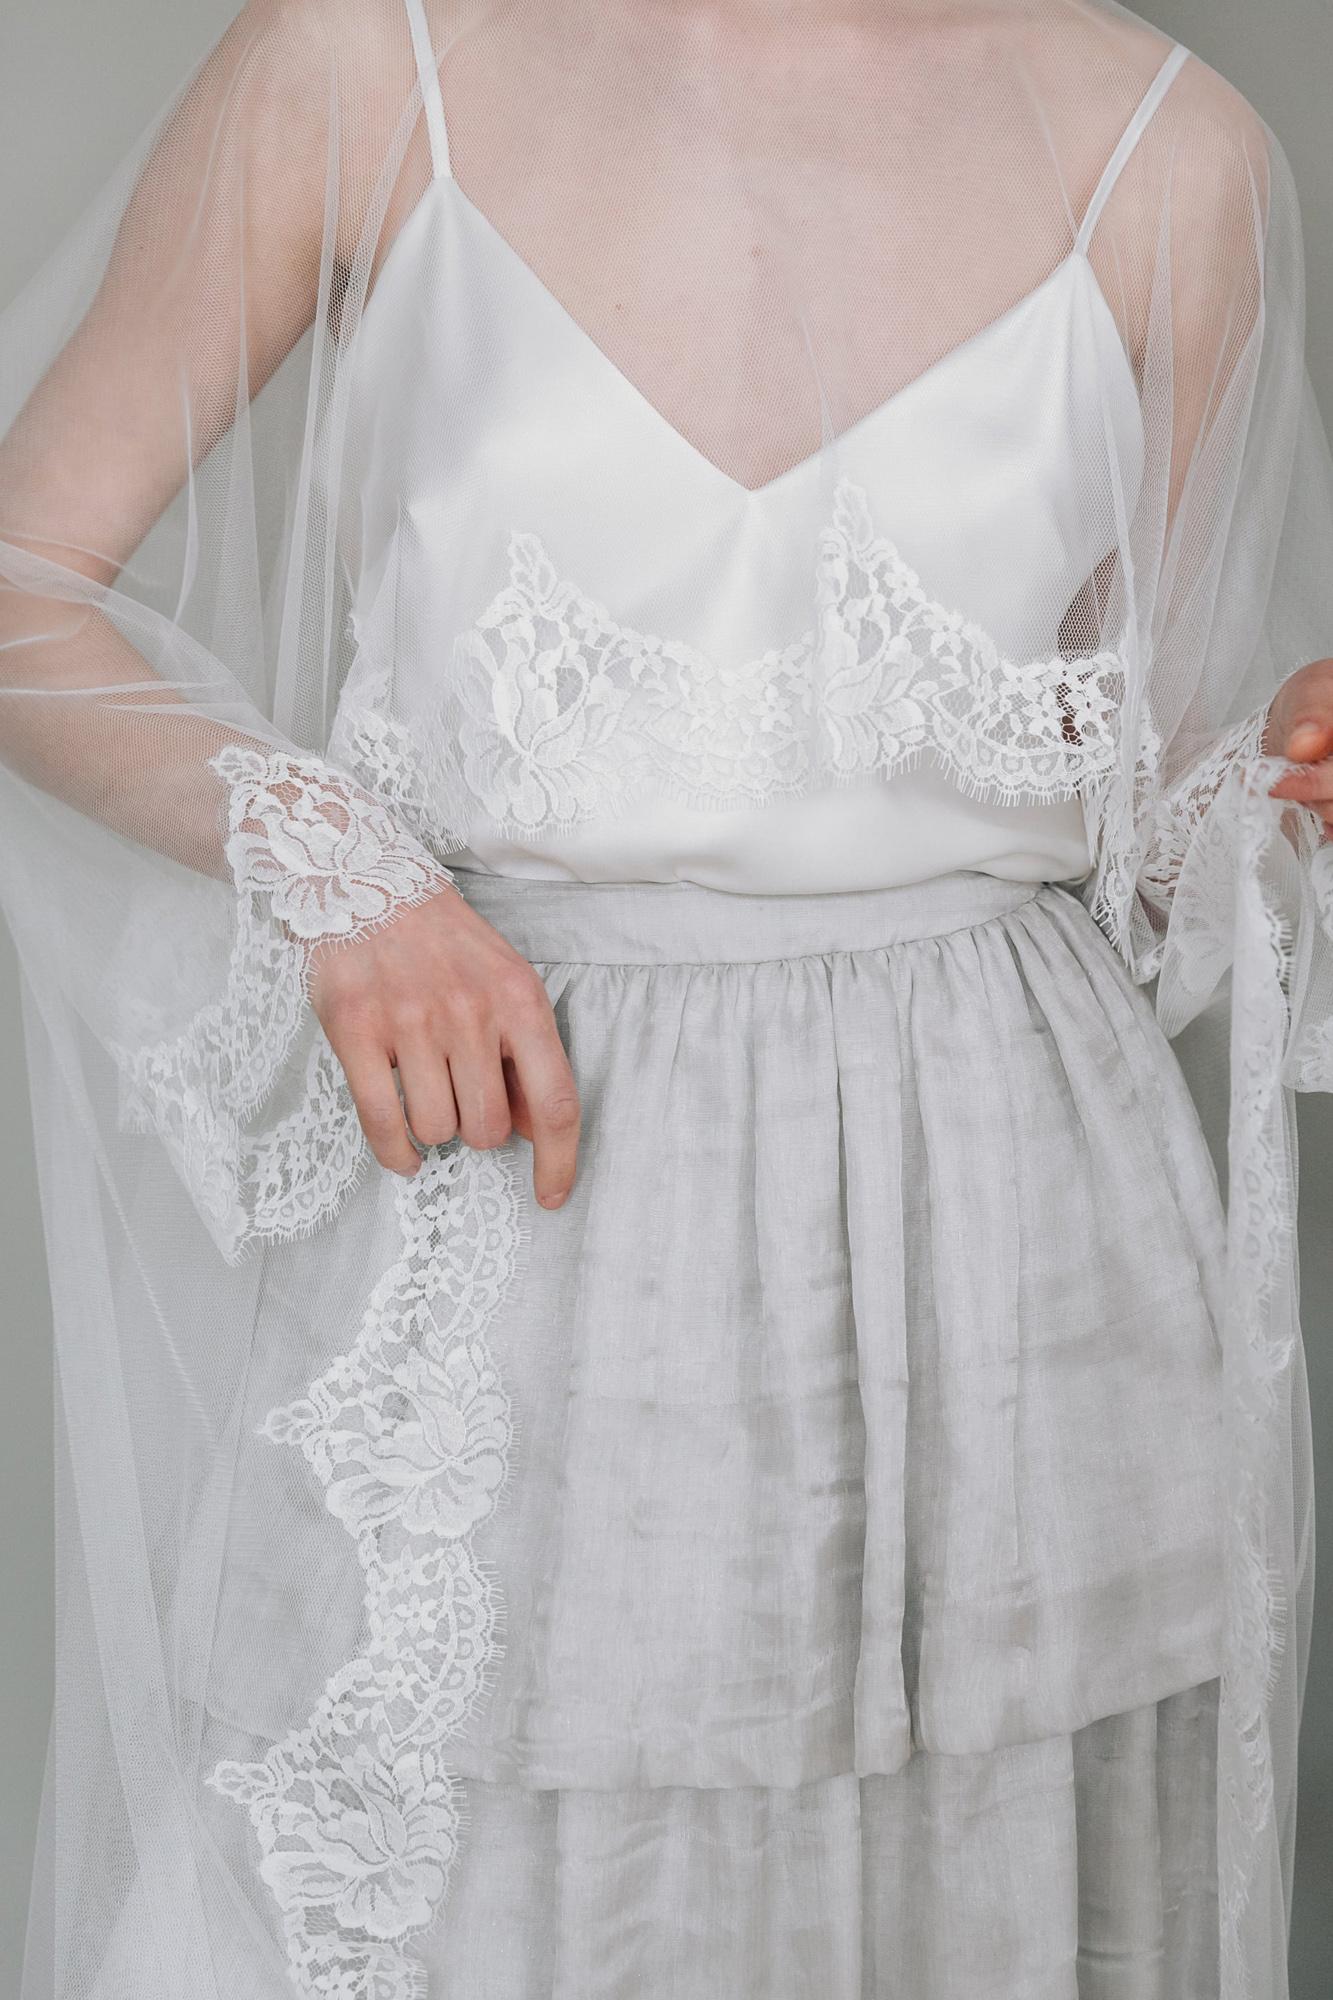 Kate-Beaumont-Sheffield-Rose-Lace-Hem-Bridal-Cape-Veil-6.jpg